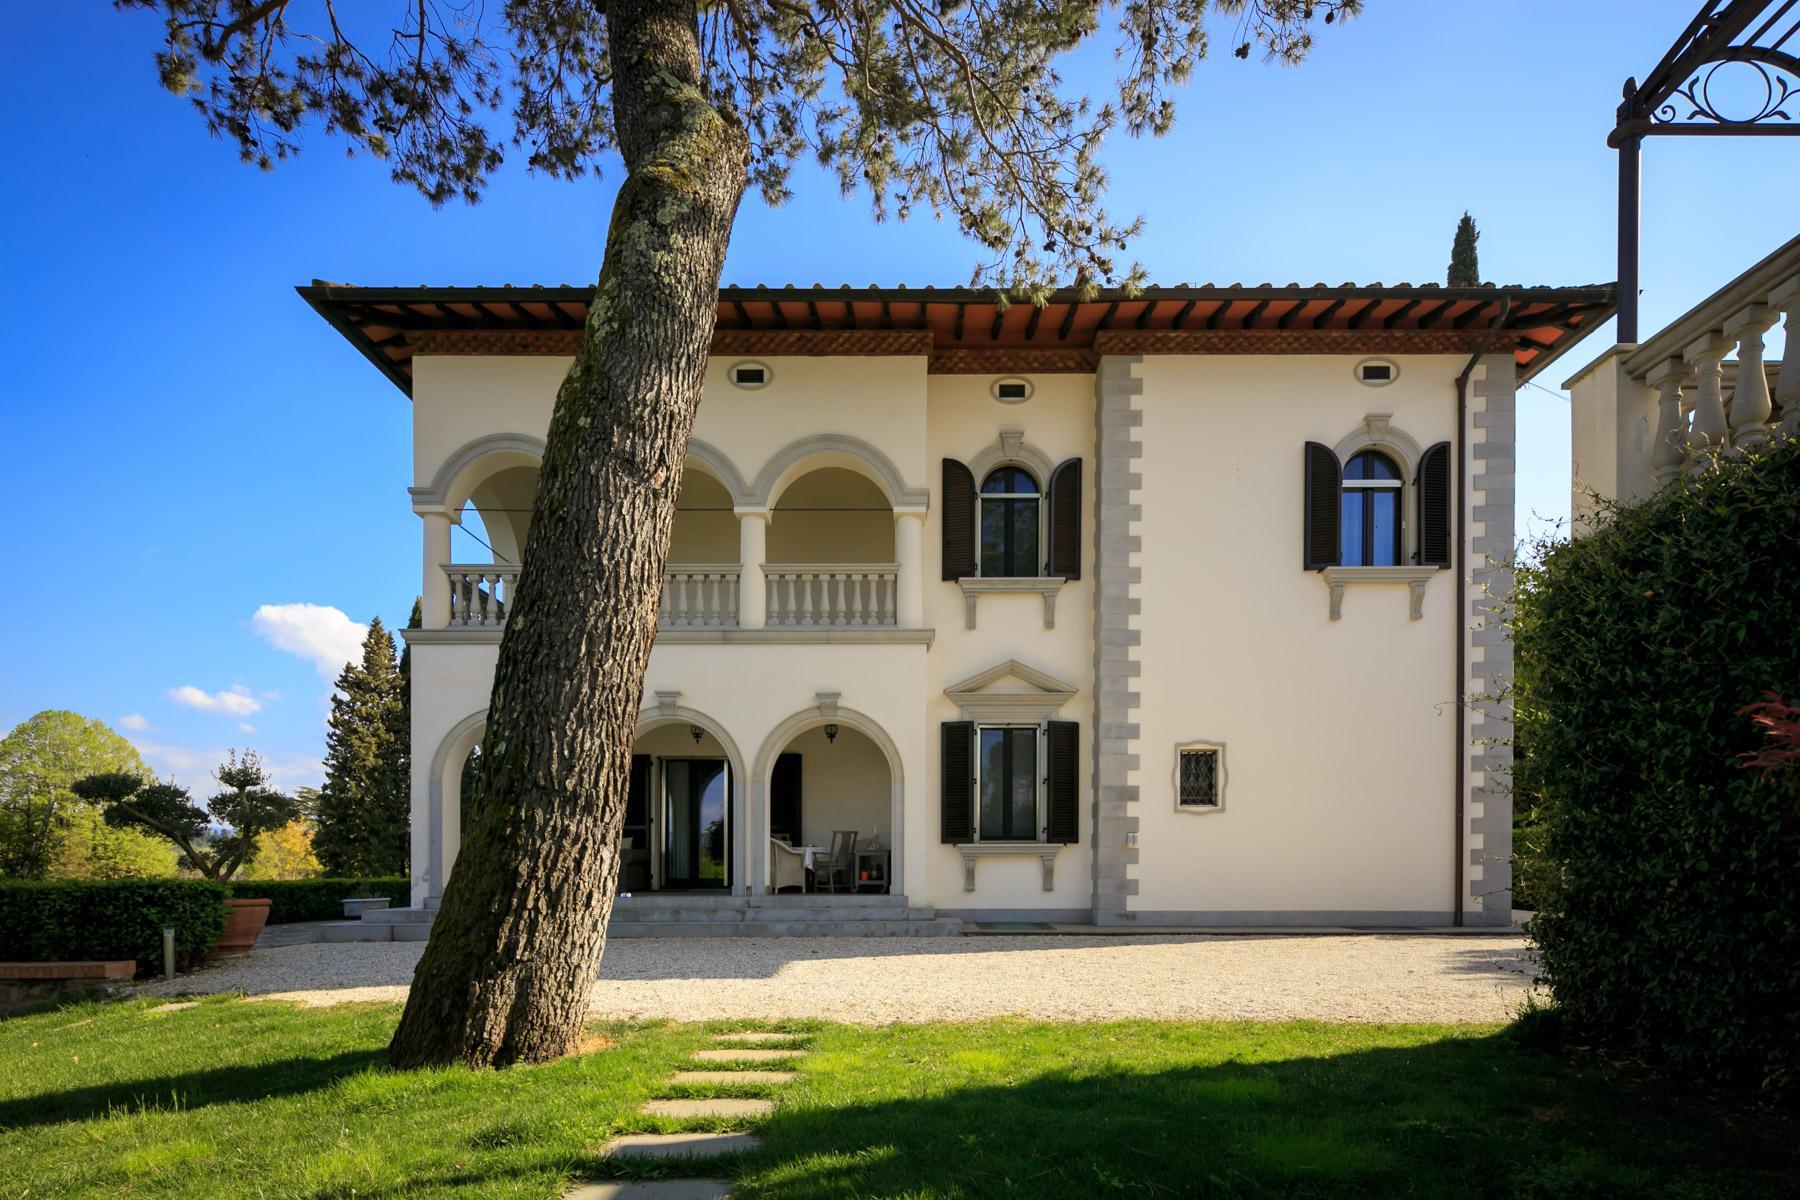 Splendide villa avec piscine à Pian dei Giullari à Florence - 3